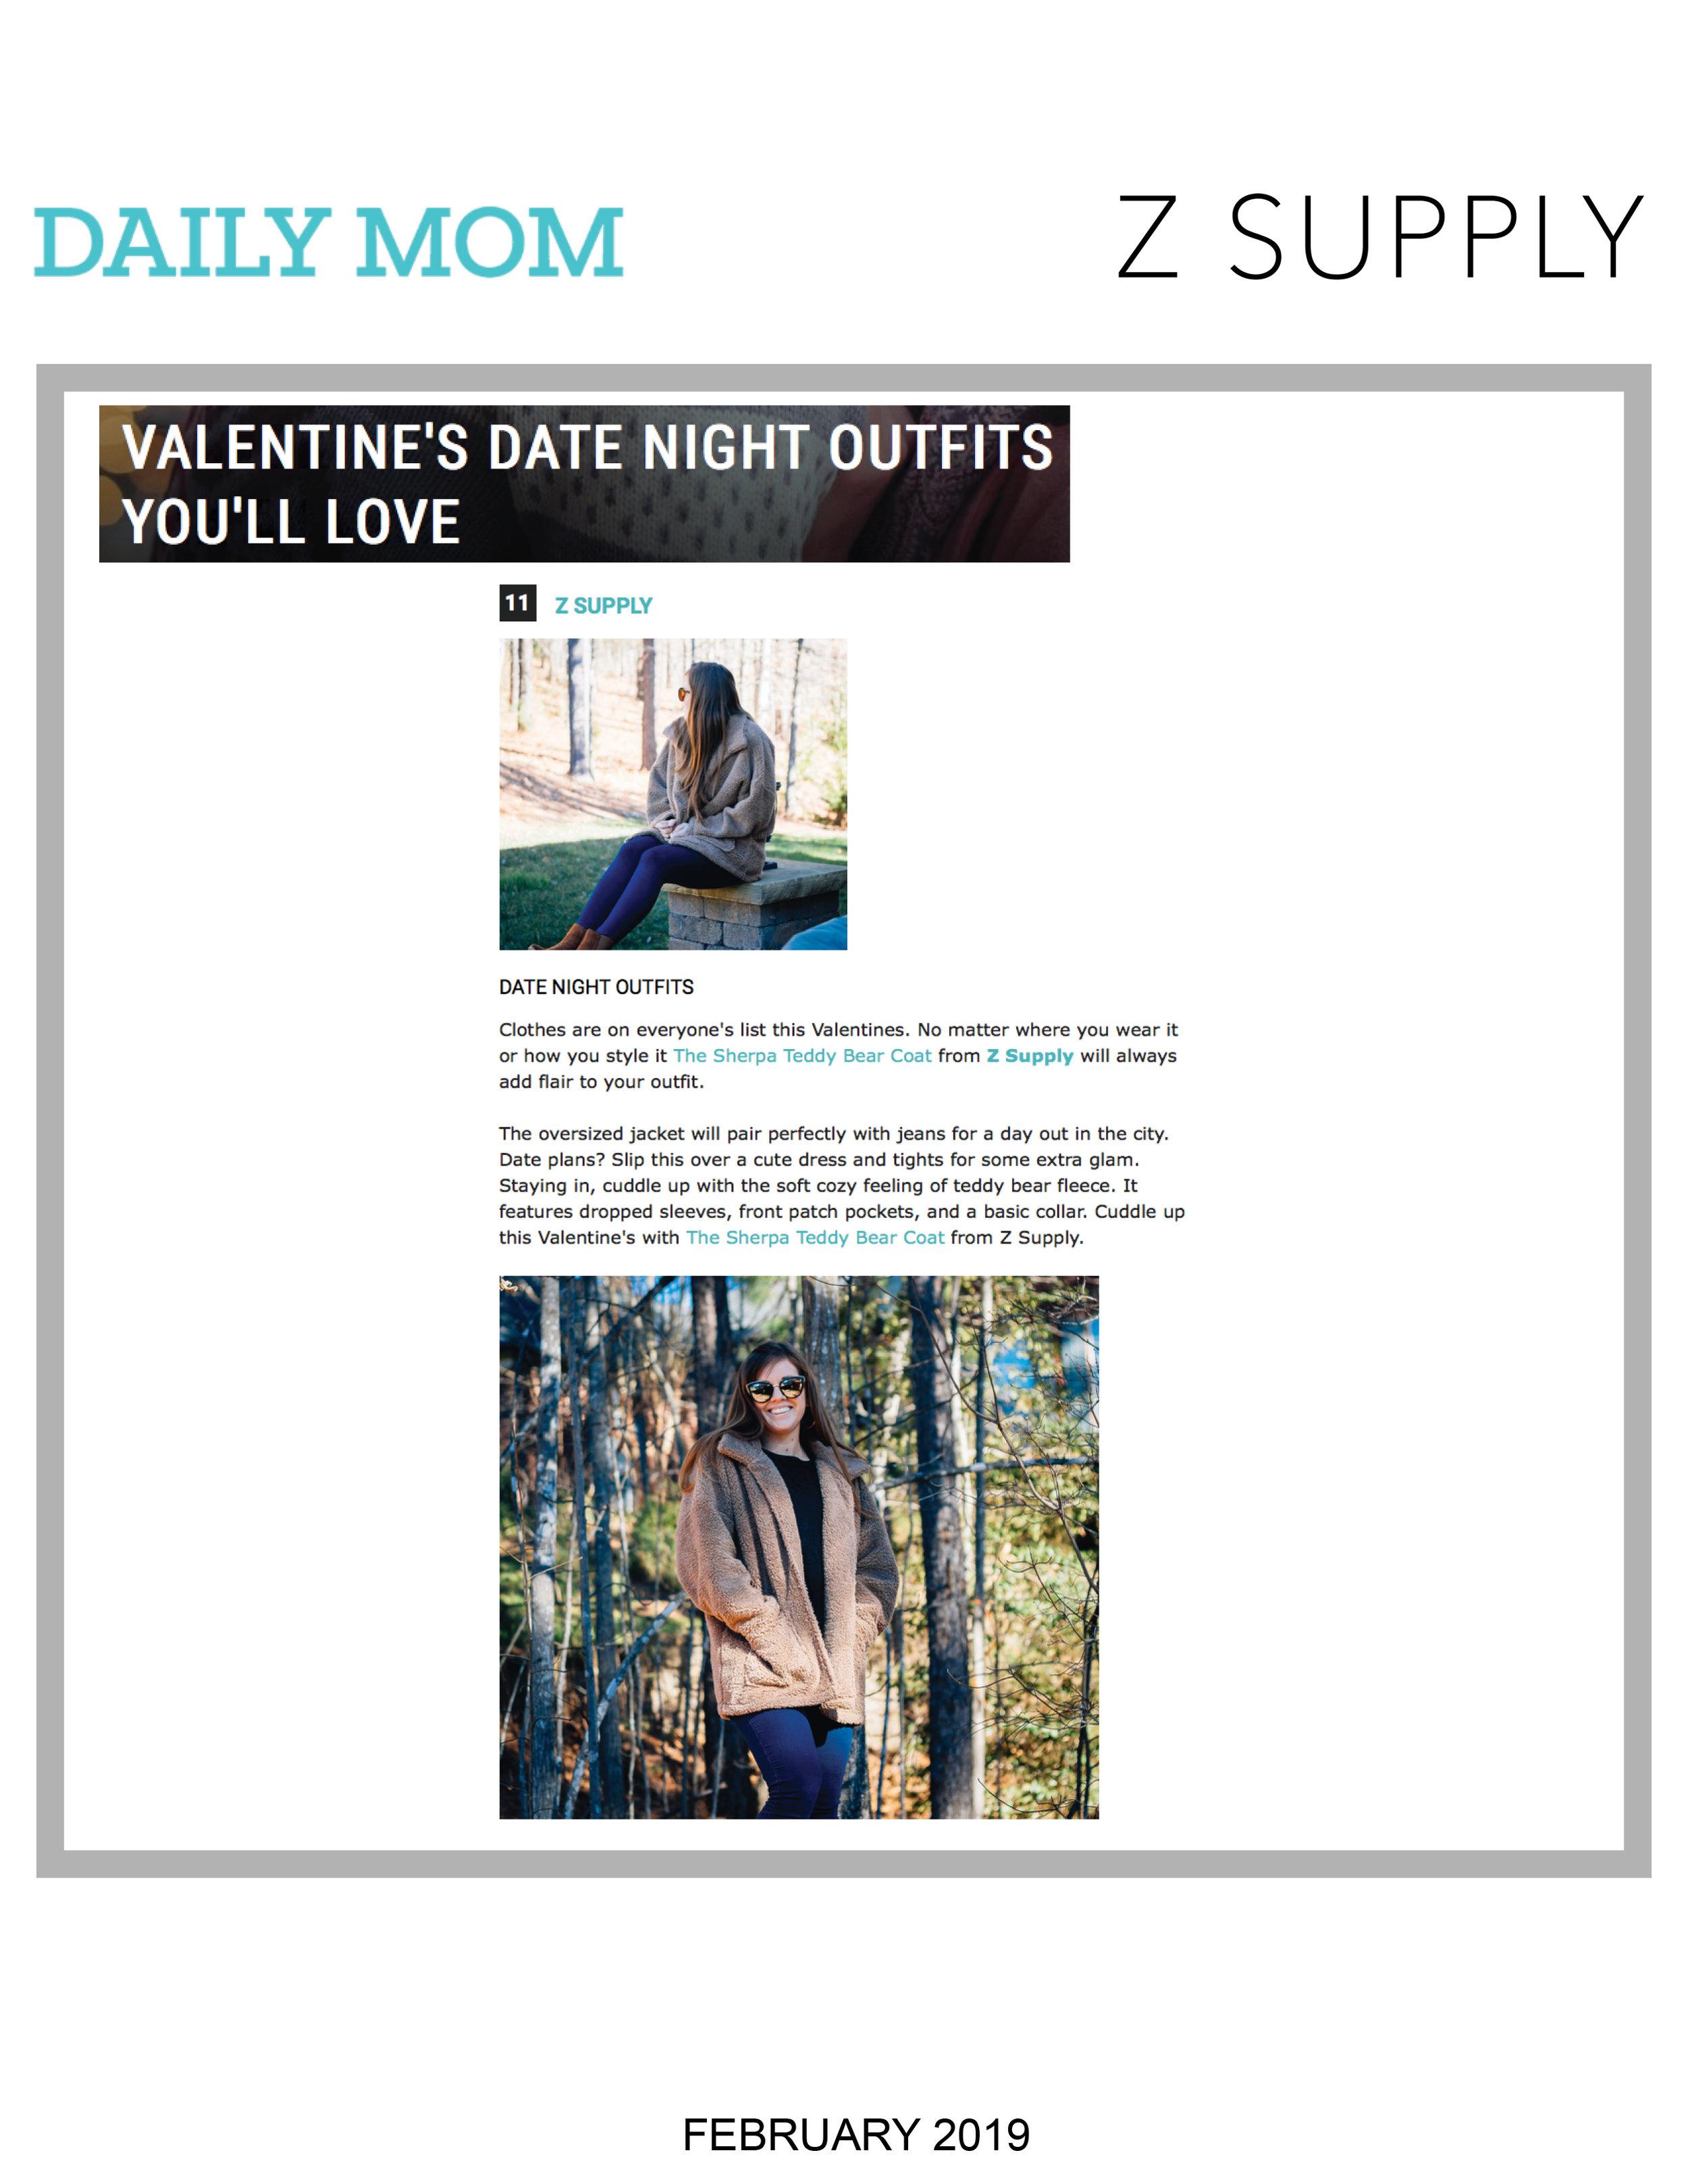 Zsupply_DailyMom_February2019.jpg